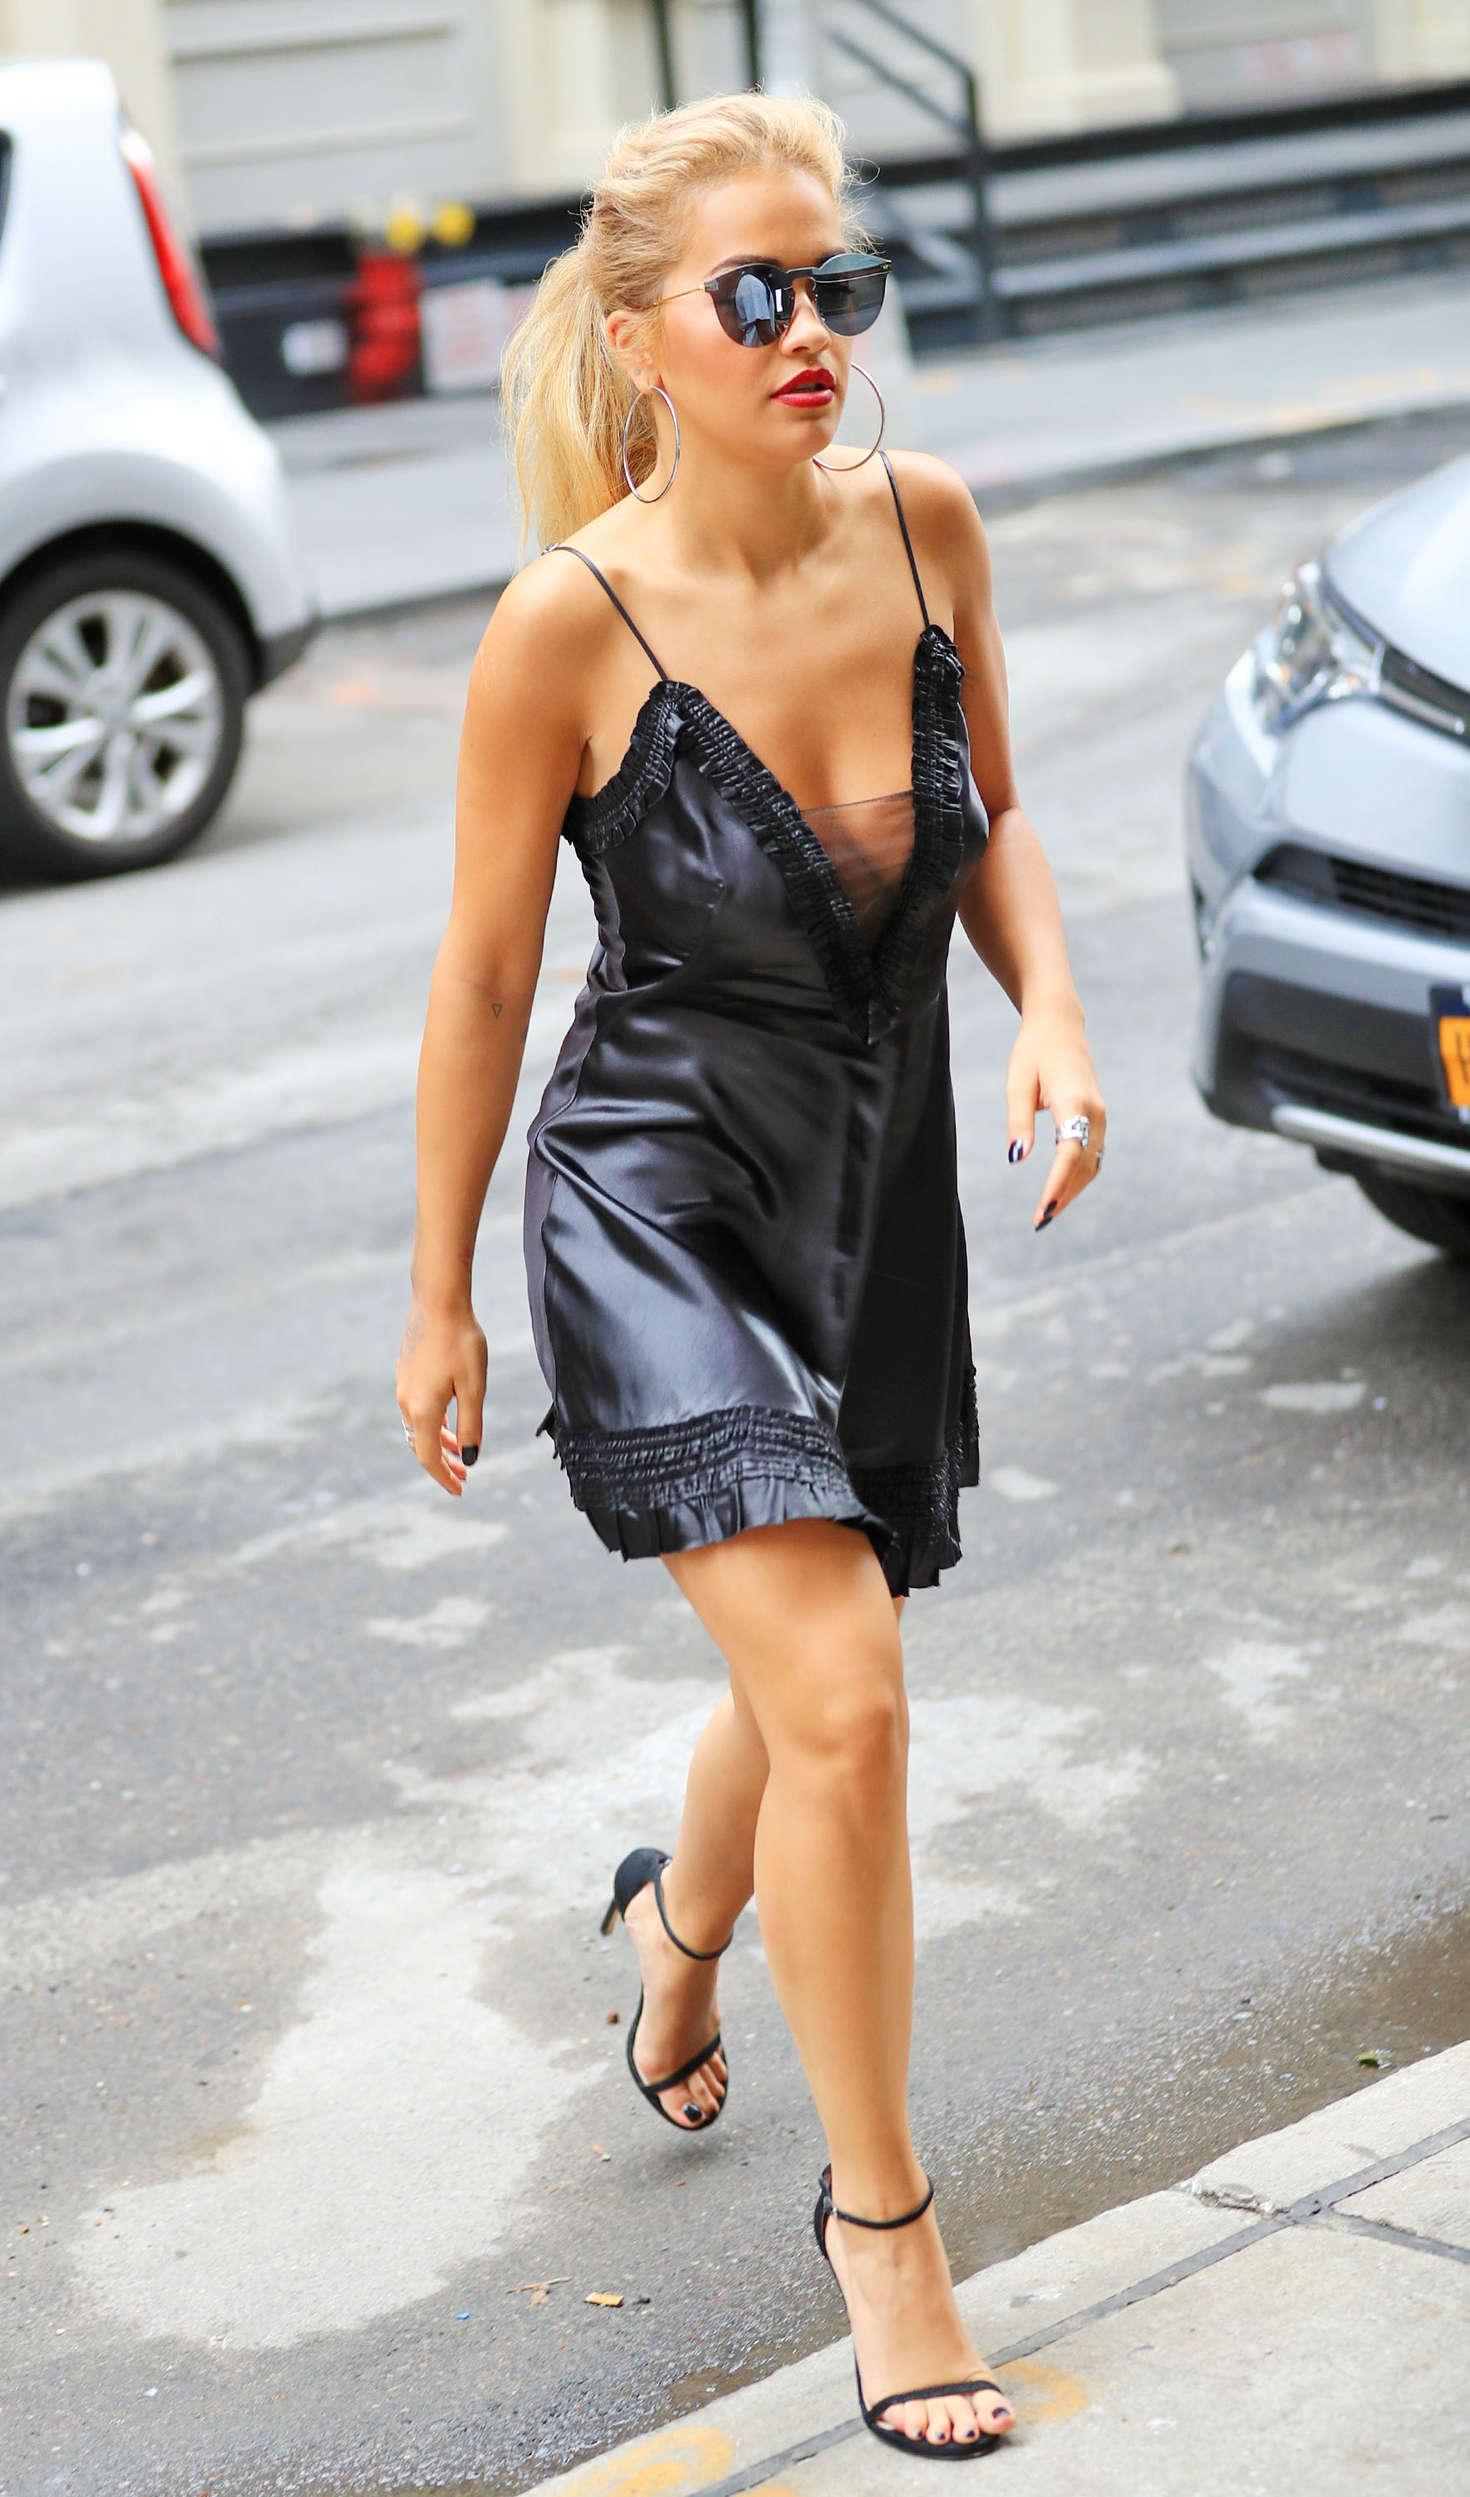 Rita Ora 2016 : Rita Ora in Black Mini Dress -16